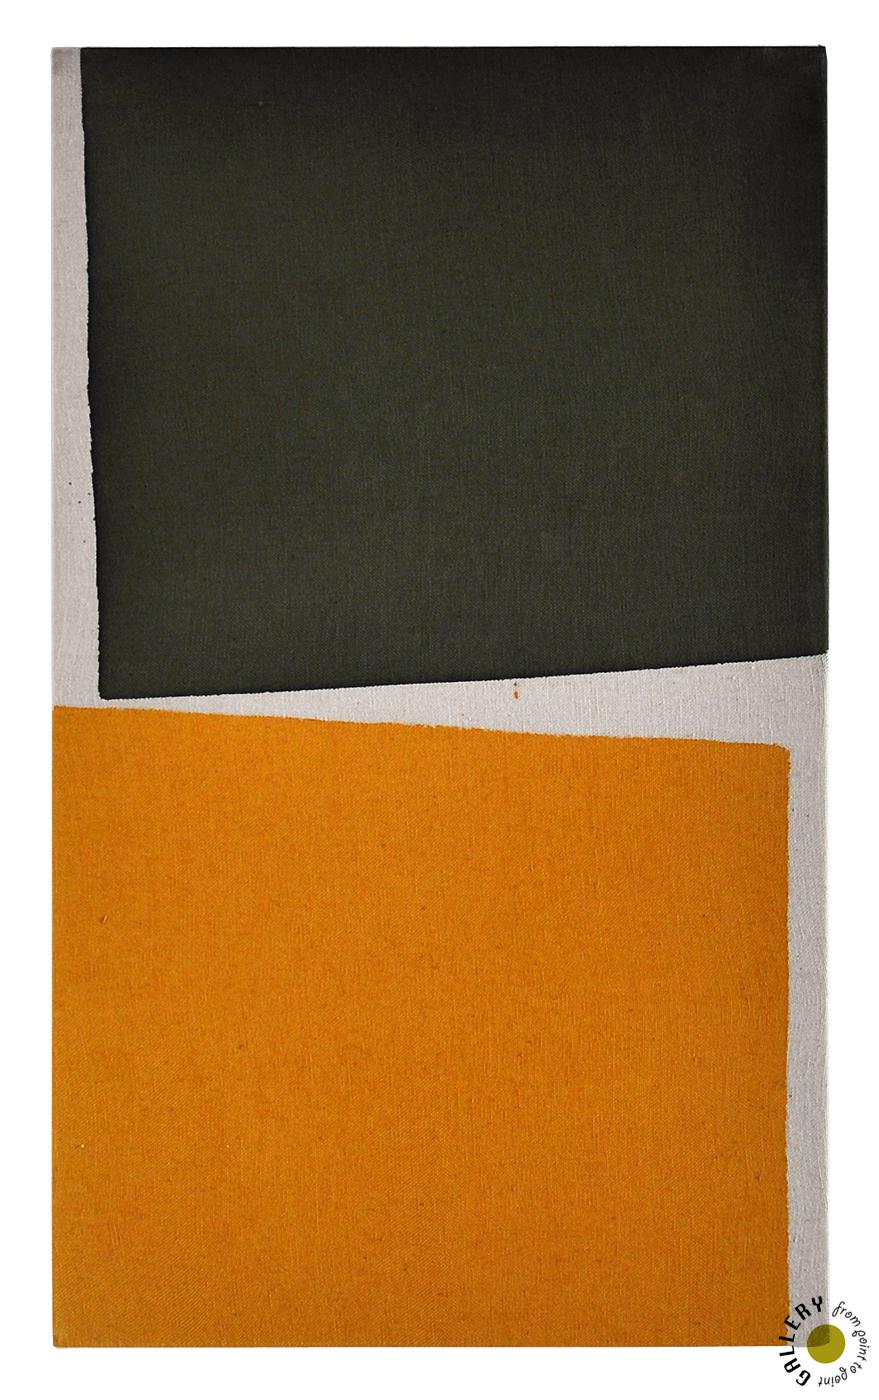 Guillaume-Moschini-Peinture-Jaune-Vert-Point-to-Point-Studio.jpg